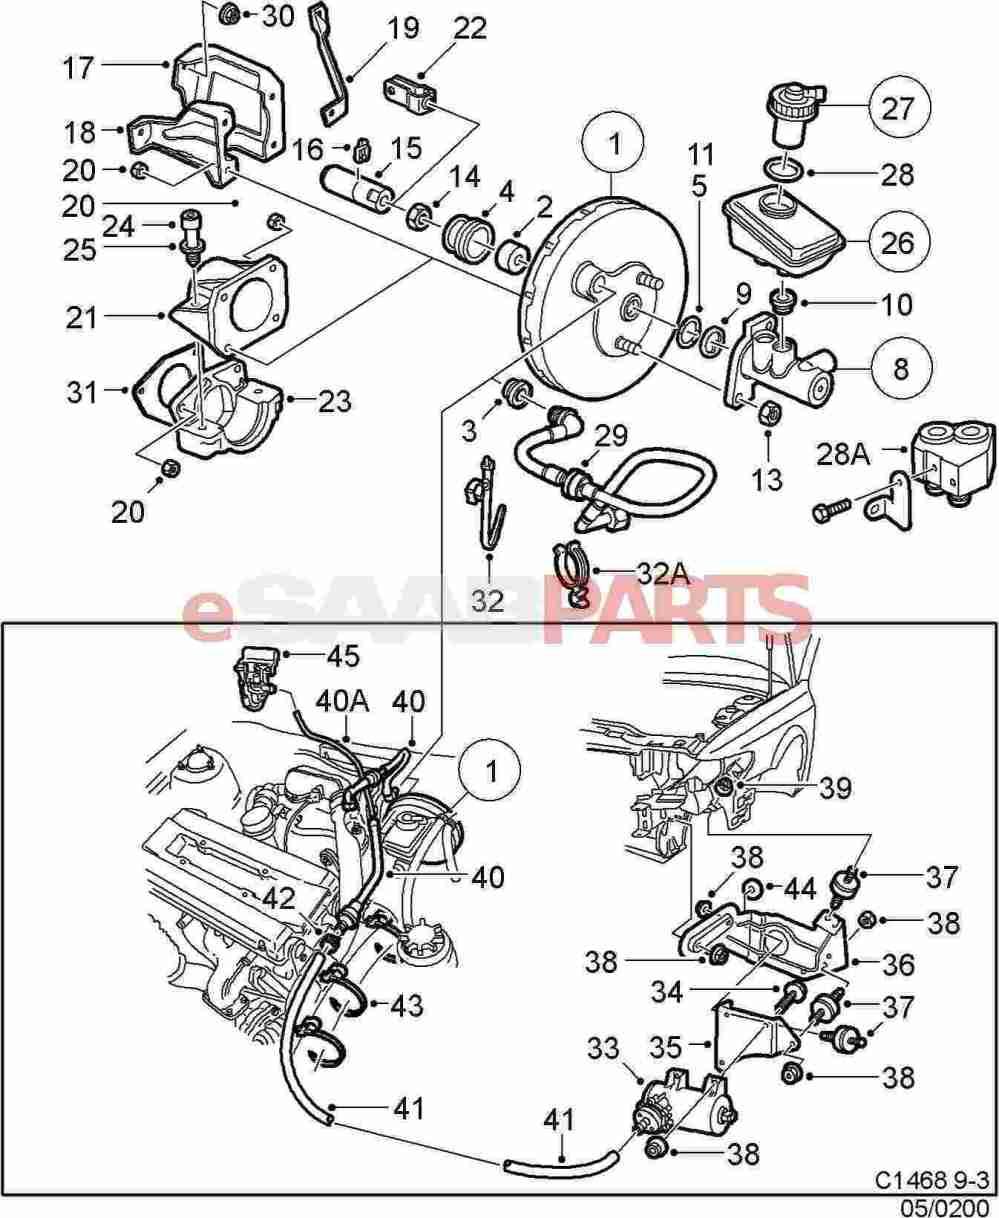 medium resolution of saab 99 engine diagram wiring schematic rh 40 yehonalatapes de 2002 saab 9 3 engine diagram saab engine diagram 205